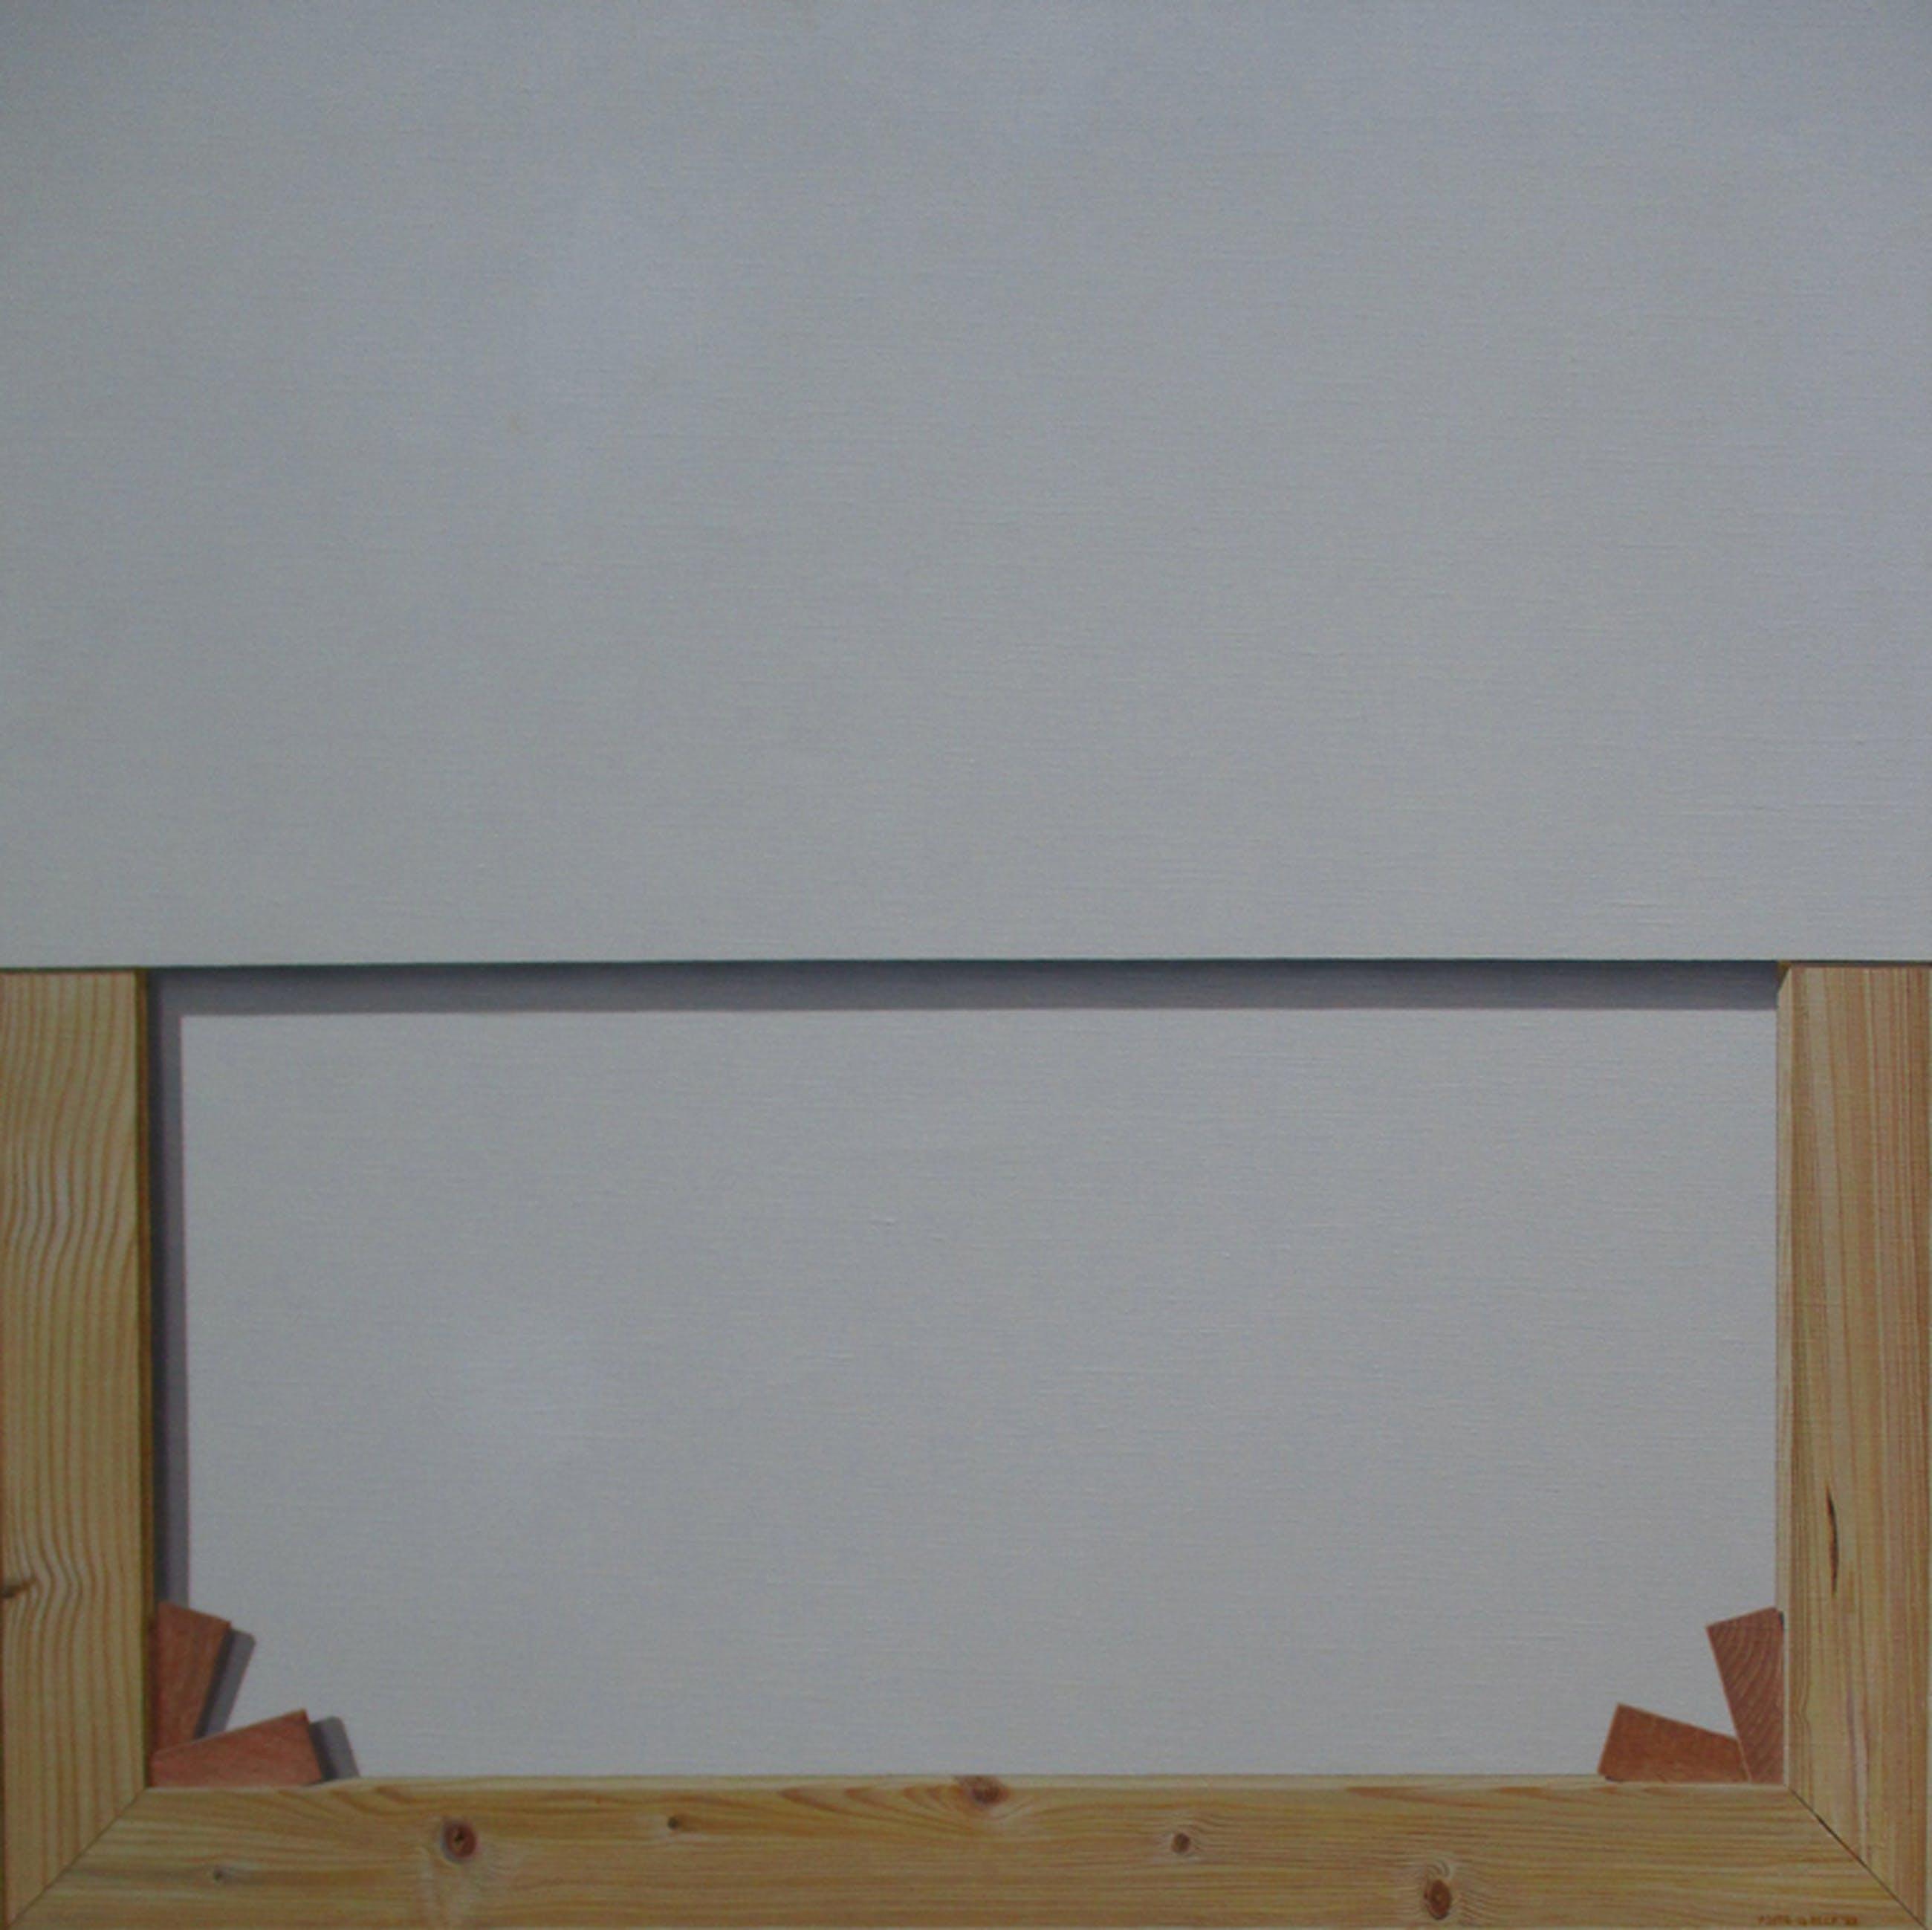 Canvas Frame Kopen.Pjotr Van Der Reep Olieverf Op Canvas Frame Kanvas 1 Kopen